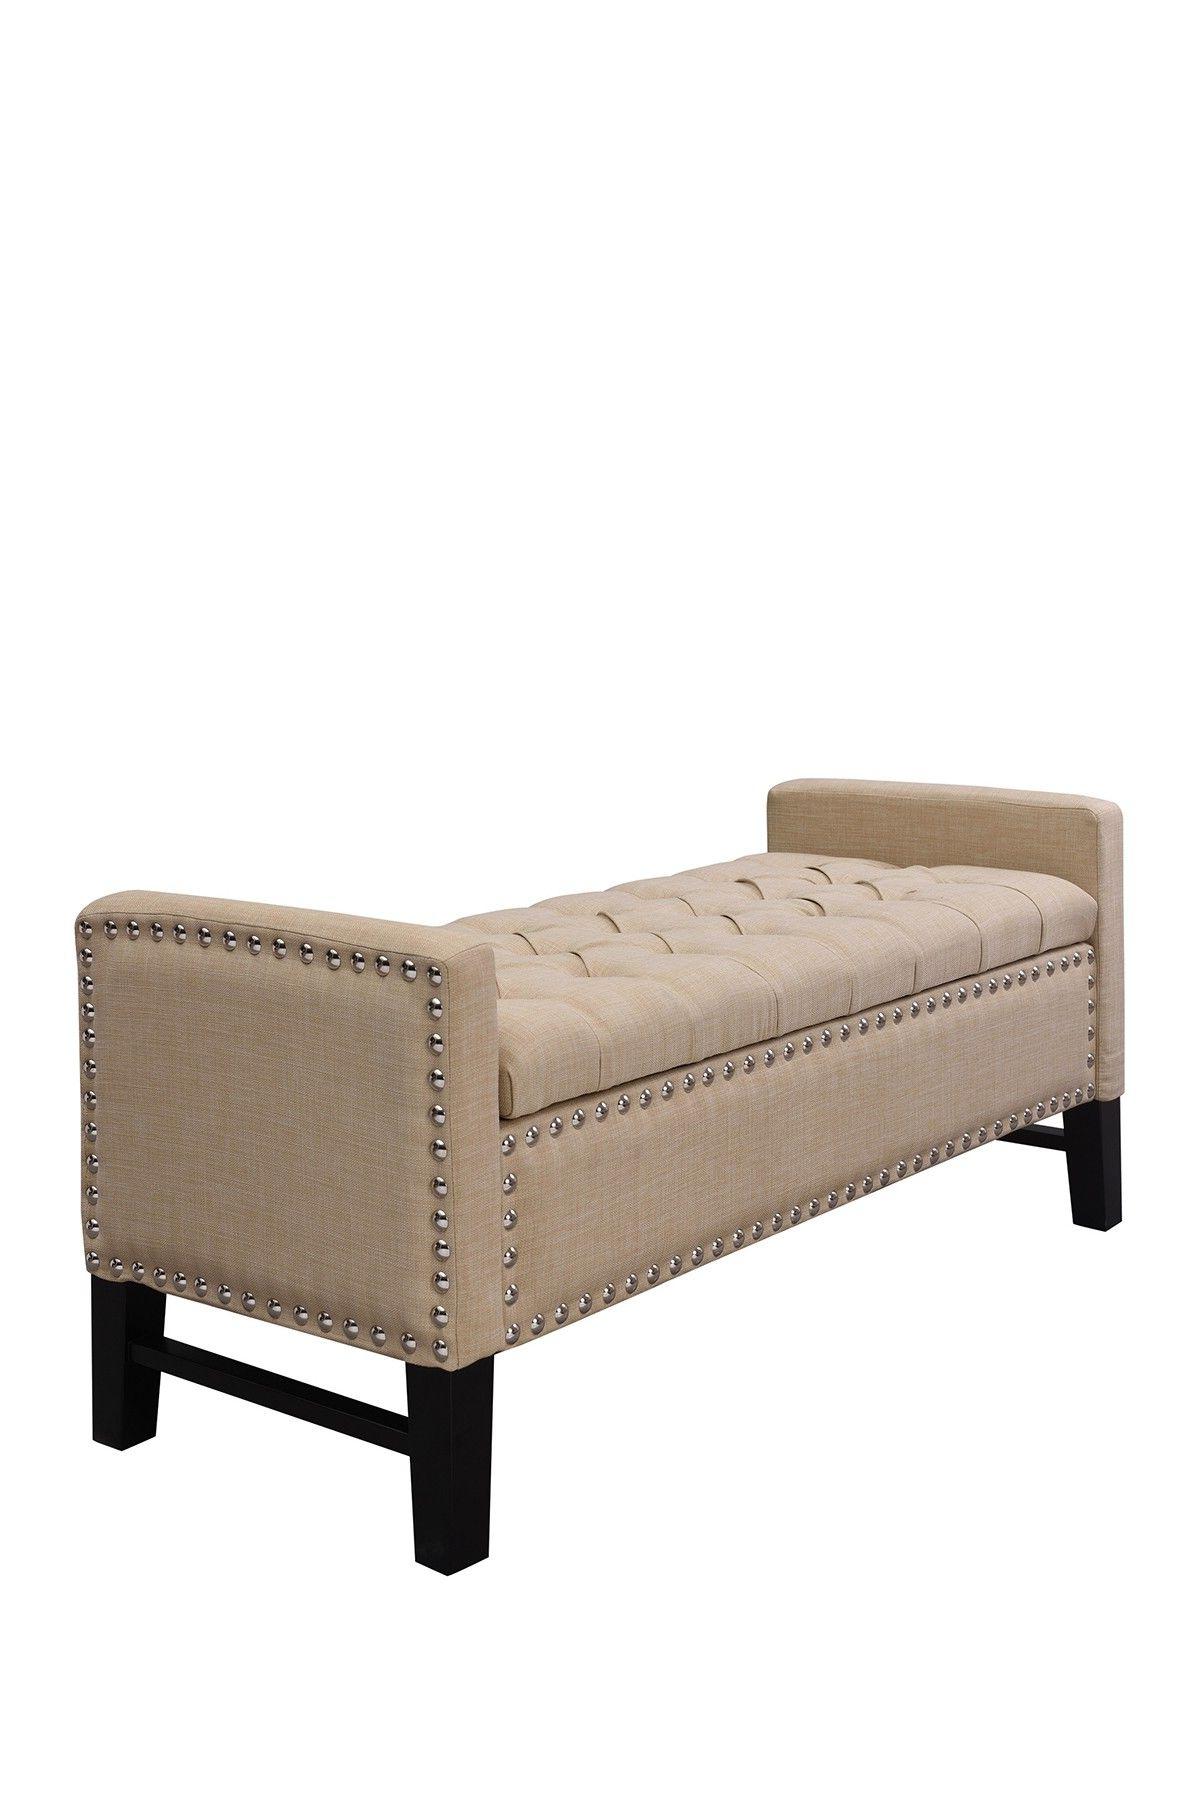 Favorite Scarlett Beige Sofas Within Inspired Home Scarlett Linen Modern Contemporary Button (View 2 of 20)